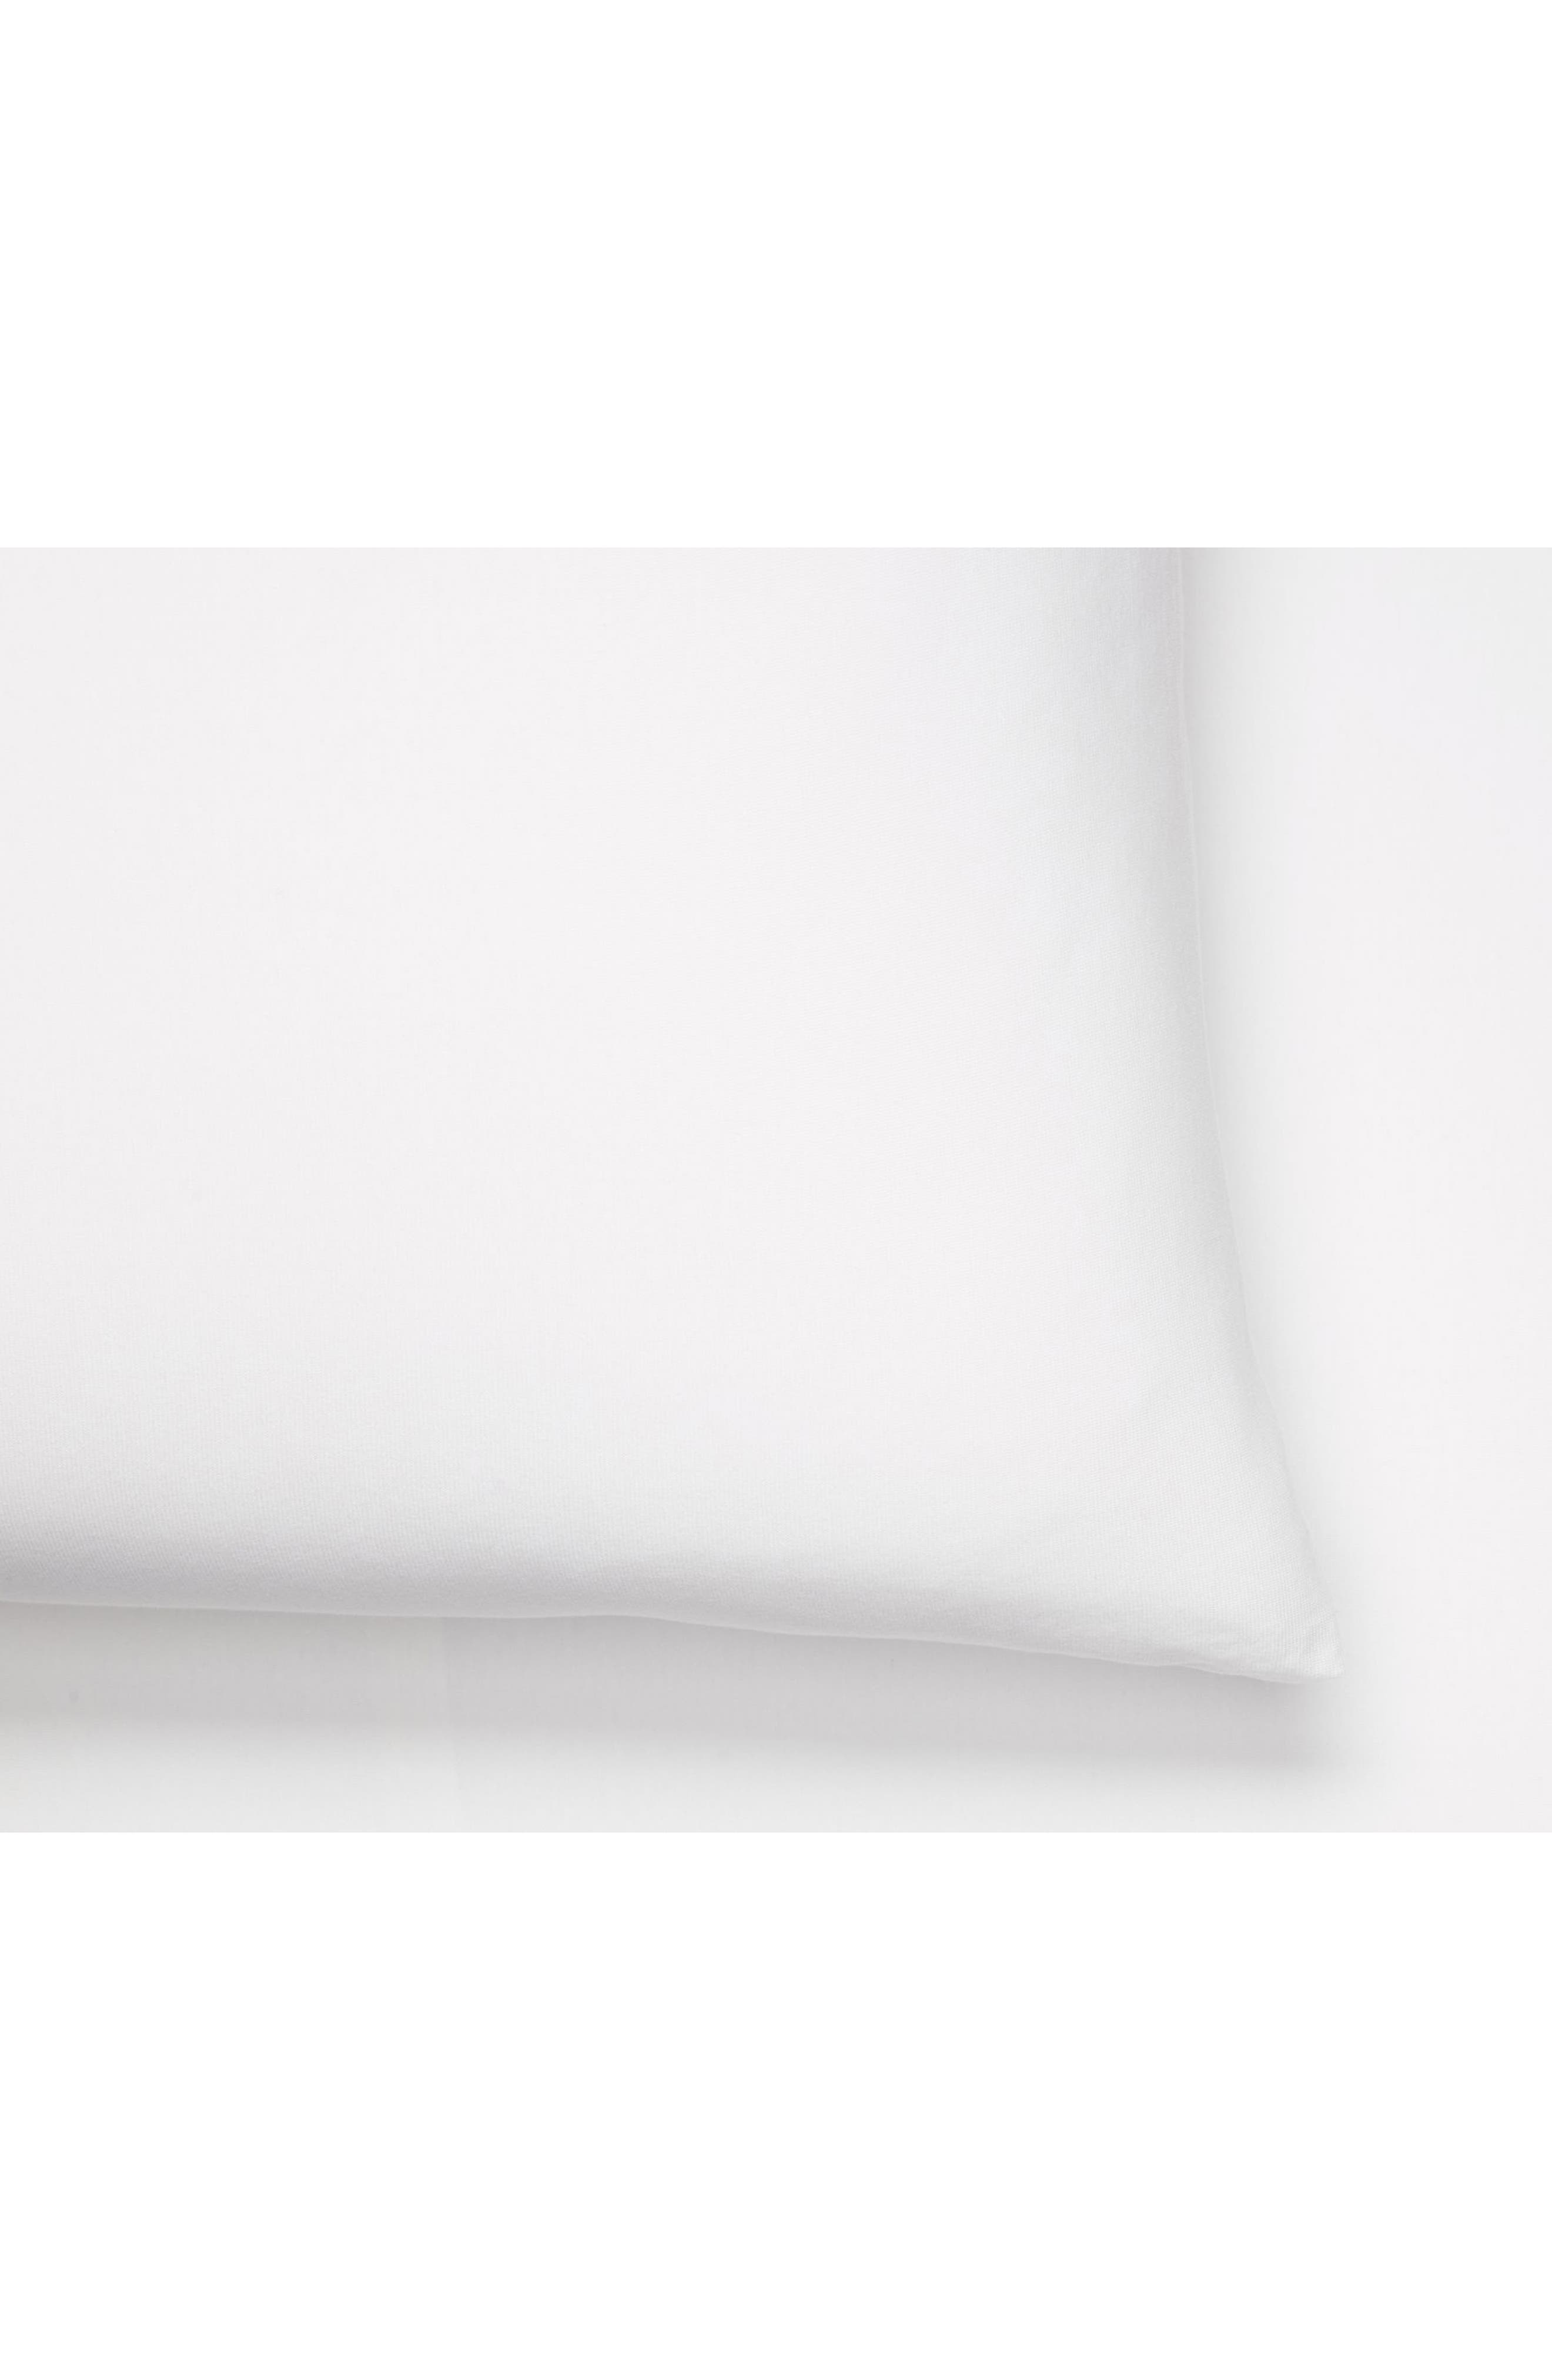 CALVIN KLEIN HOME,                             Harrison Pillowcases,                             Alternate thumbnail 2, color,                             WHITE